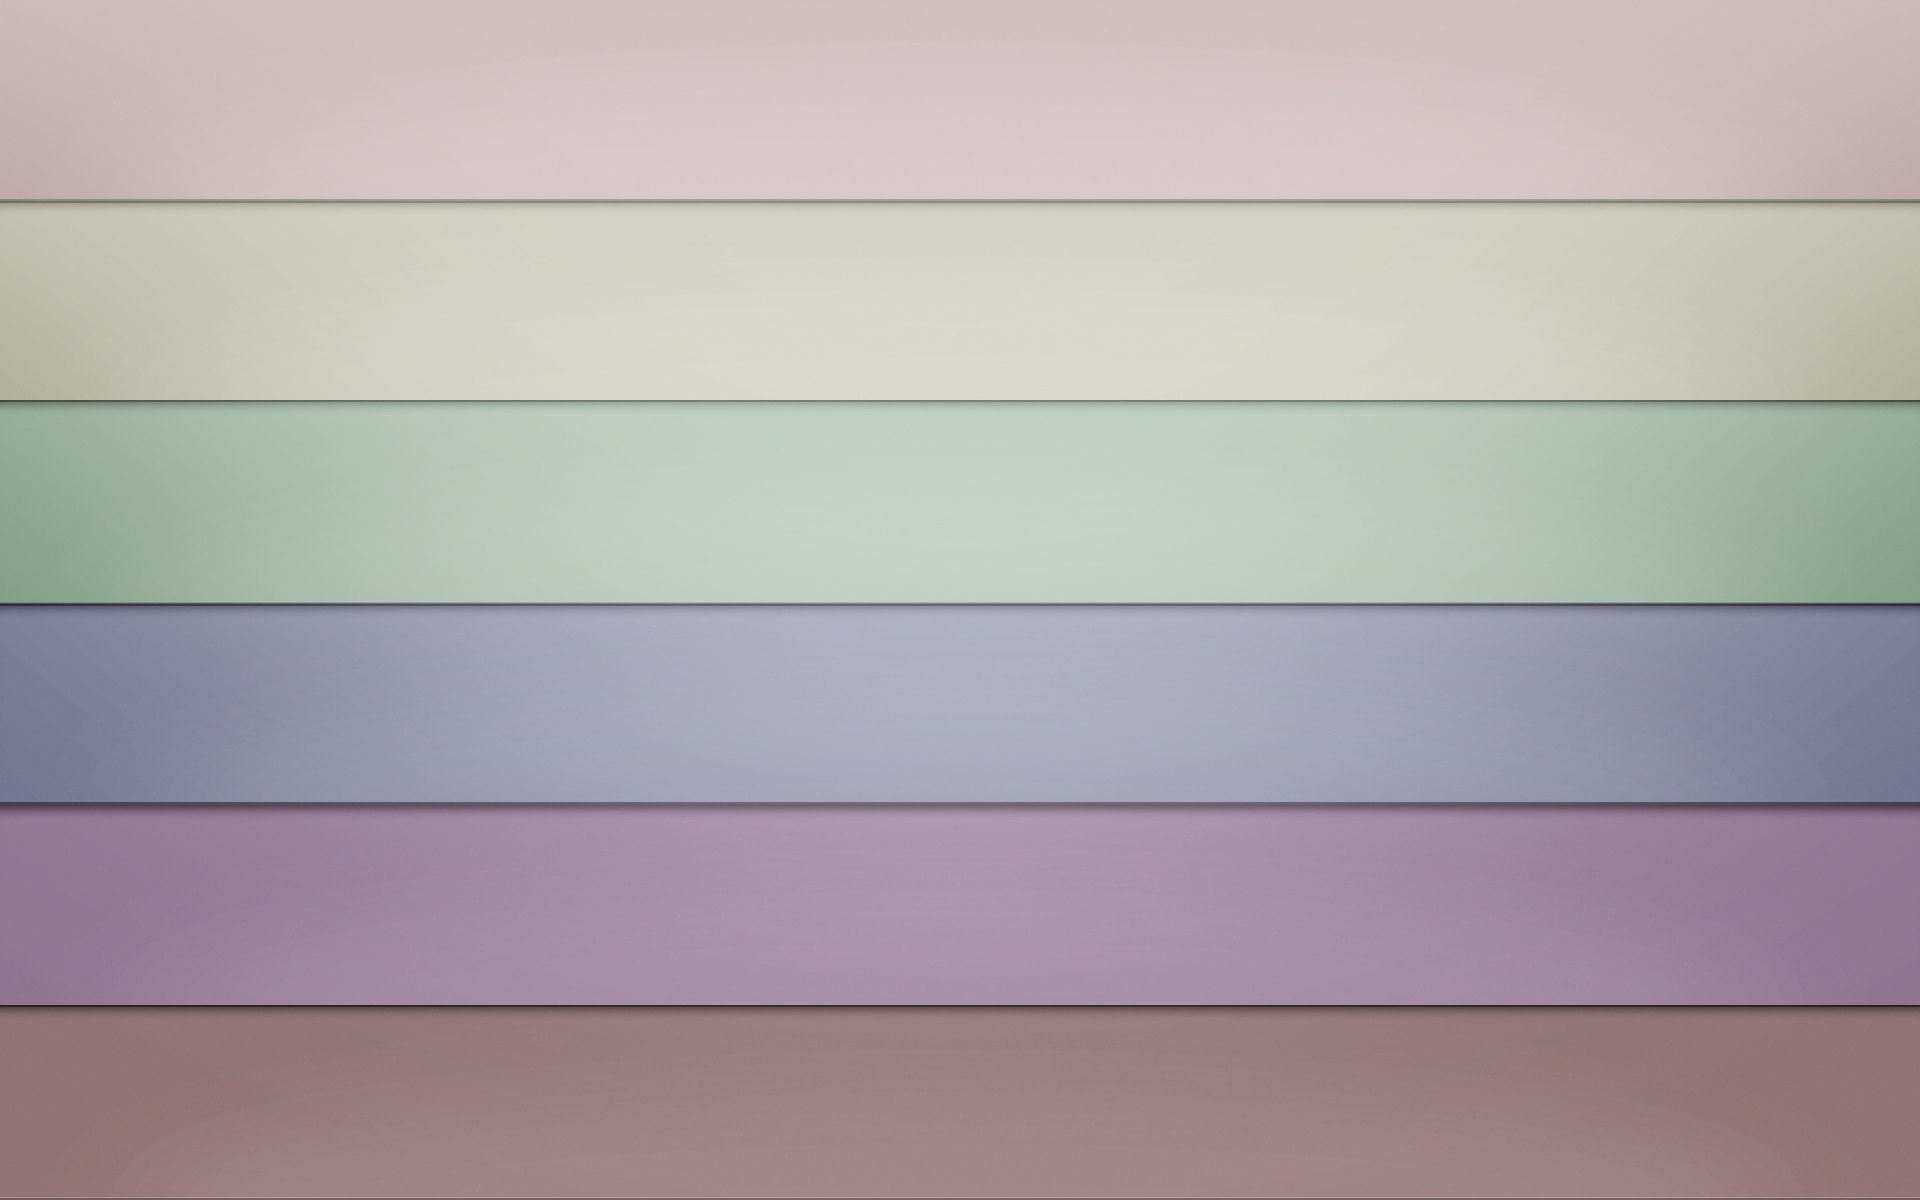 Just Pastel Tumblr Purple Wallpaper Iphone Purple Wallpaper Pastel Color Wallpaper